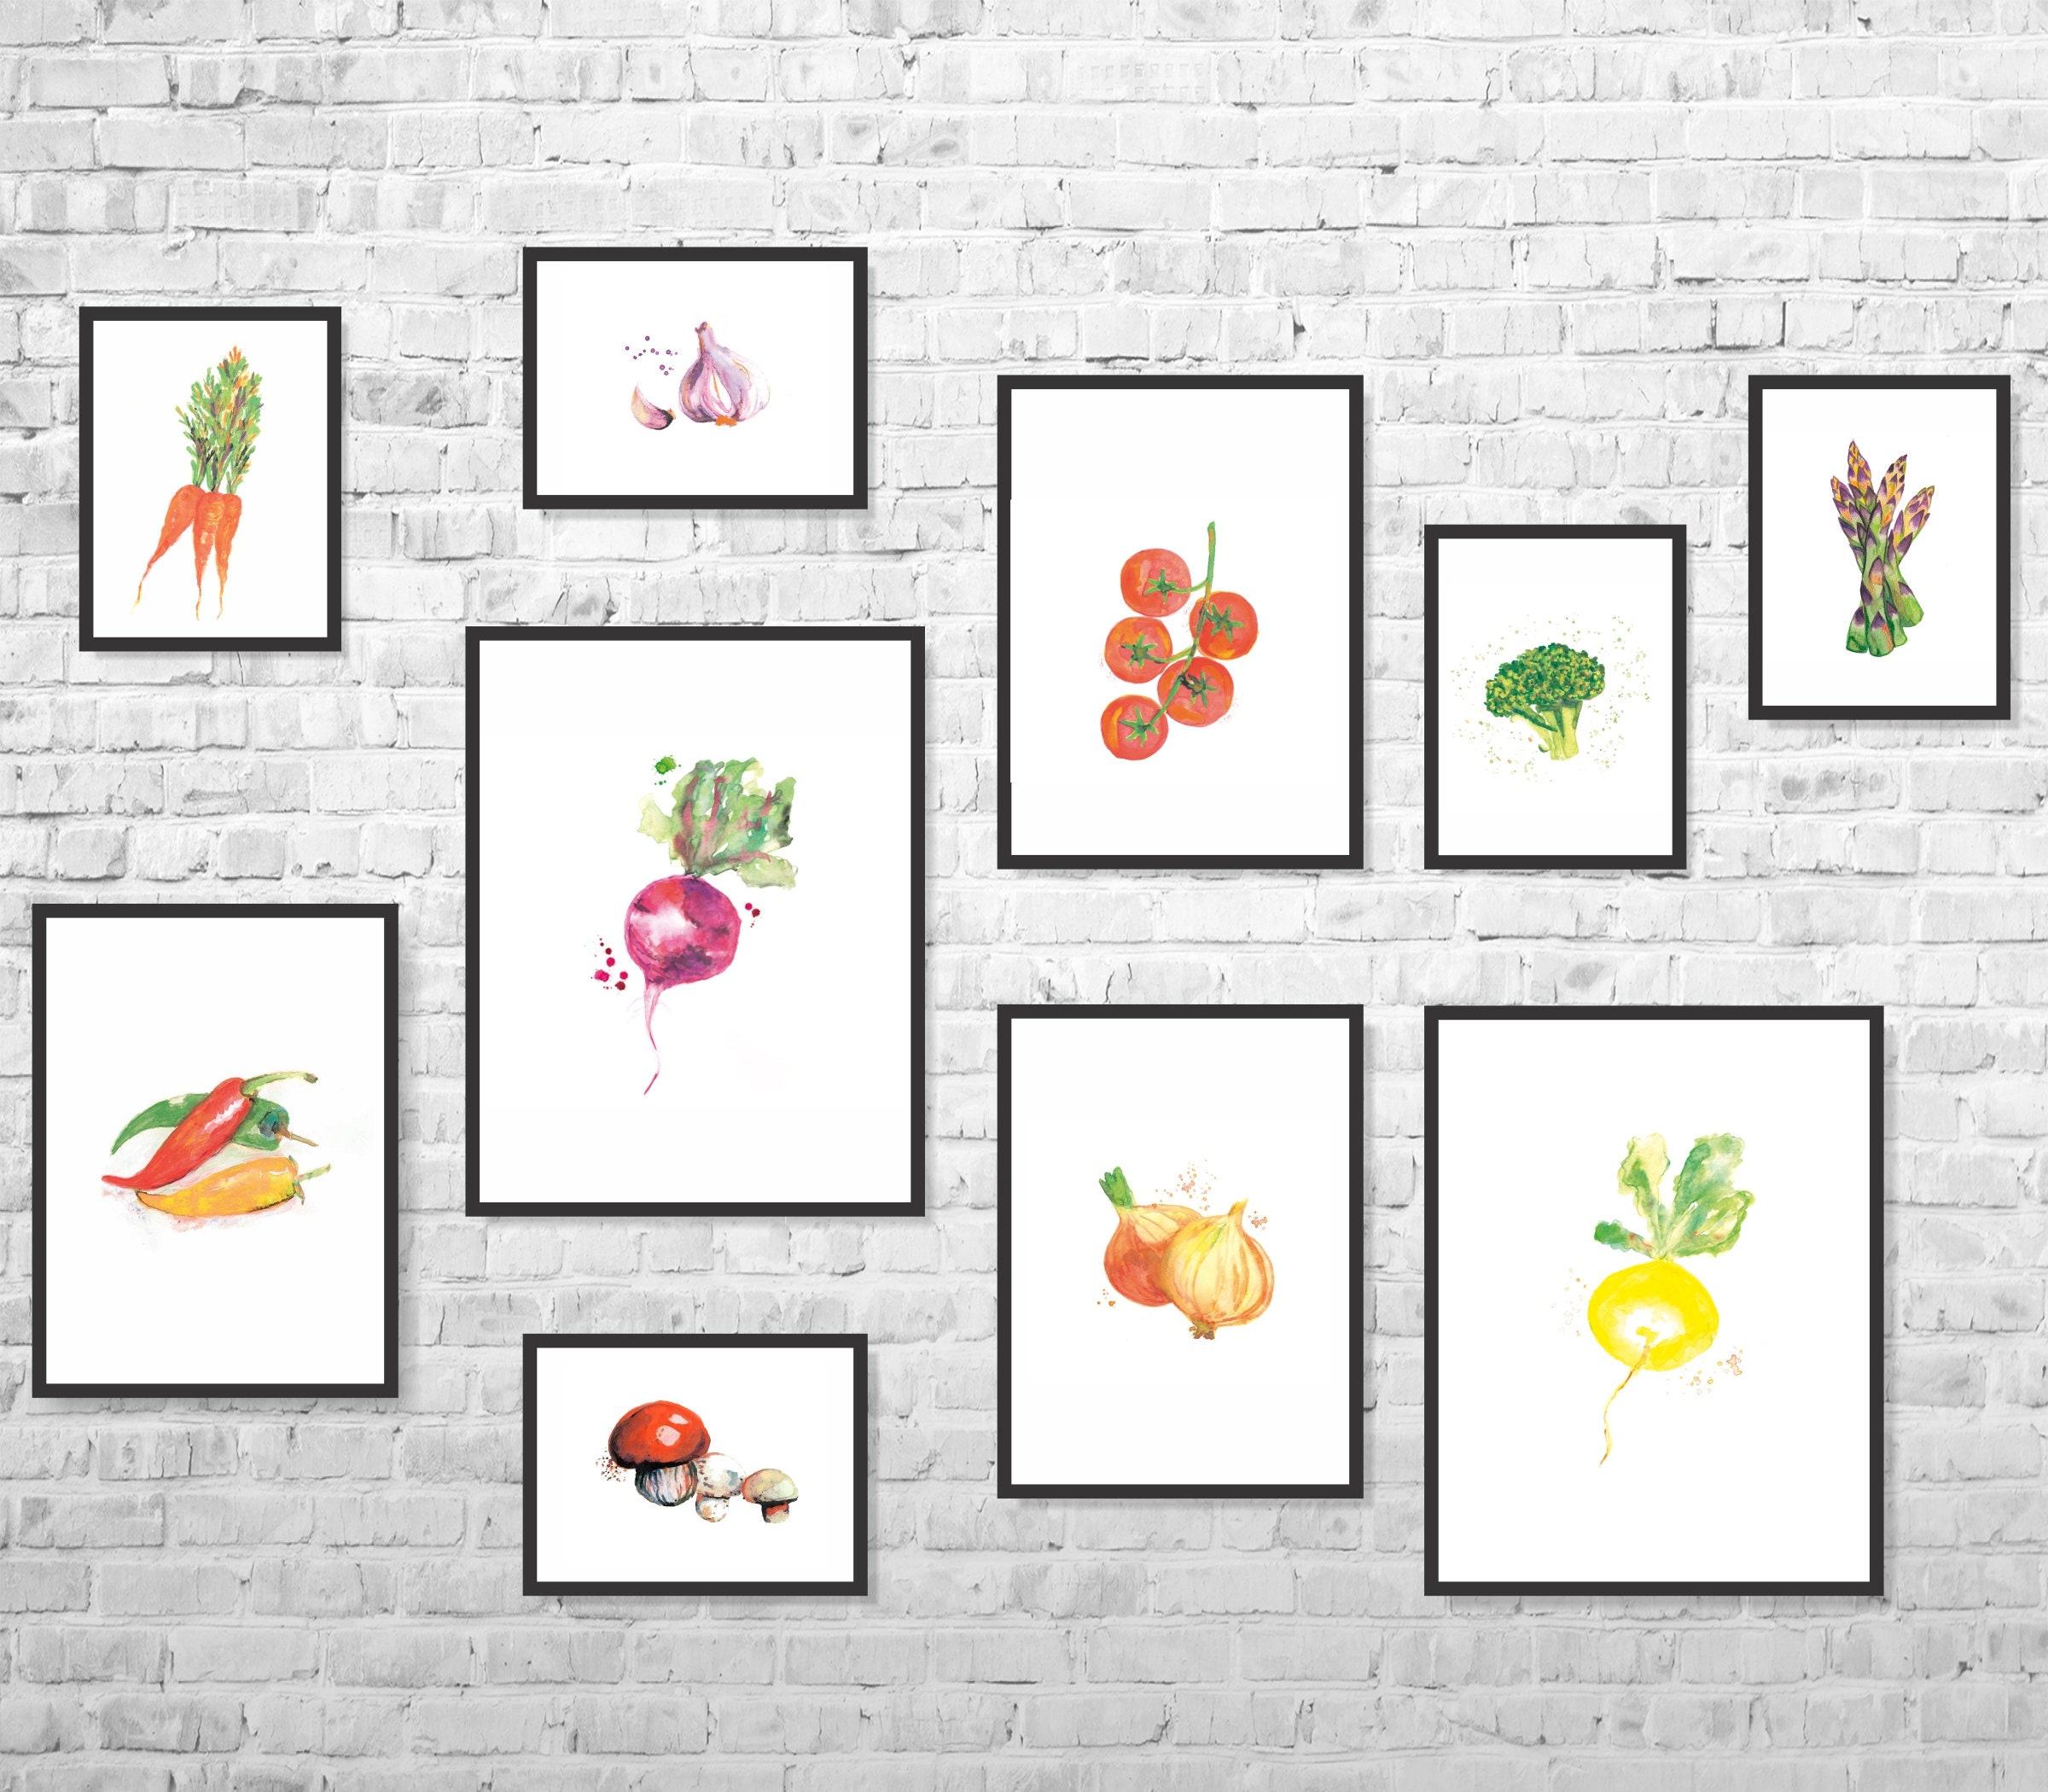 Kitchen Decor Vegetables: Vegetables Decor-Kitchen Decor-Vegetables Print-Vegetables